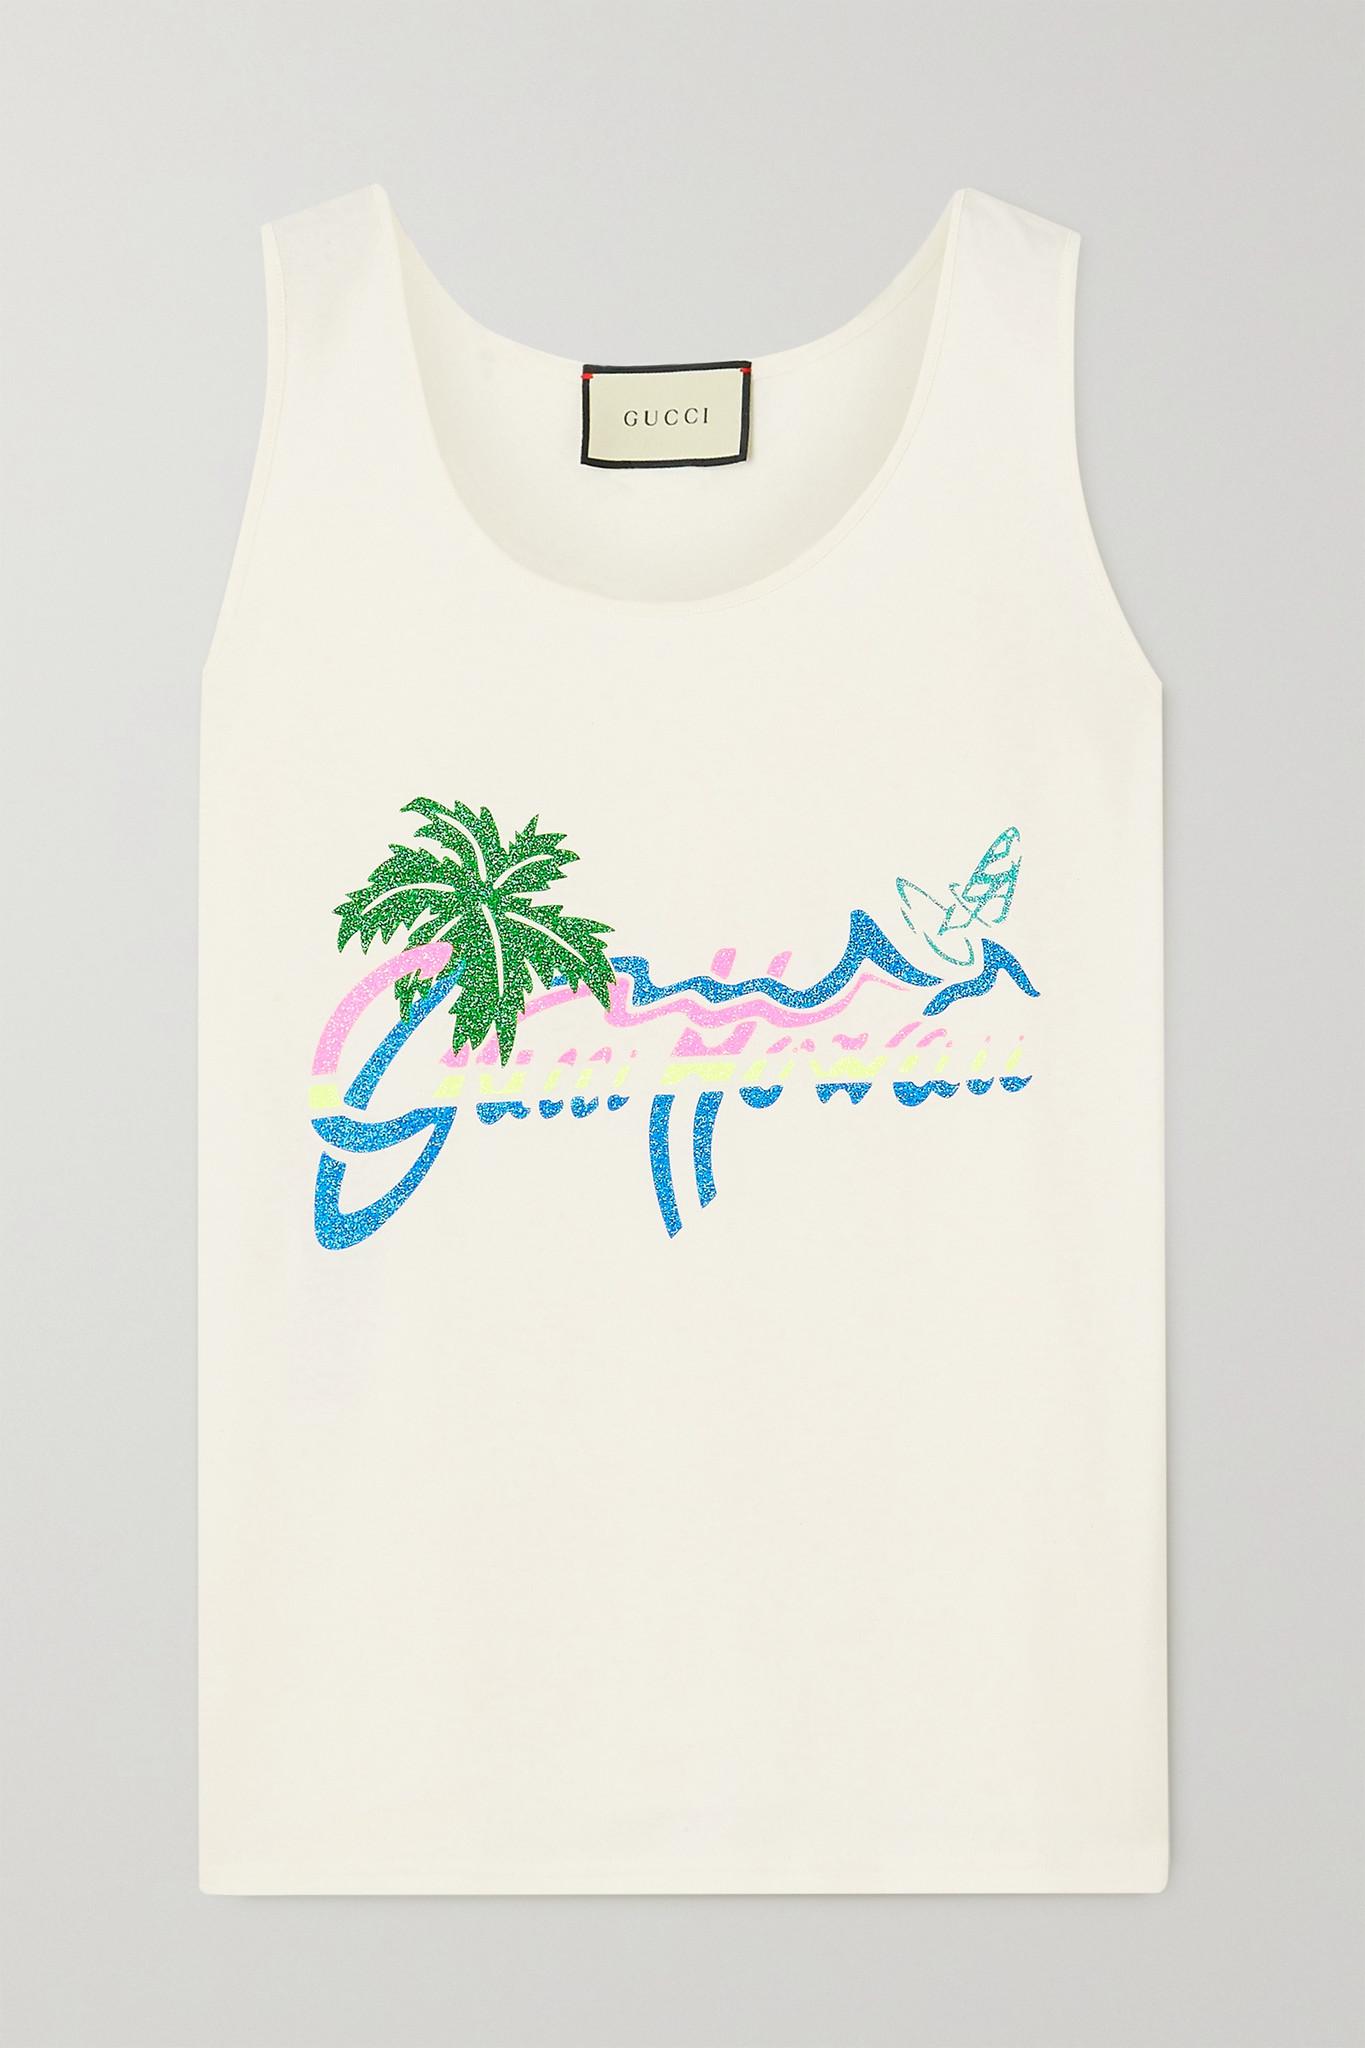 GUCCI - + Net Sustain Glittered Printed Organic Cotton-jersey Tank - White - small